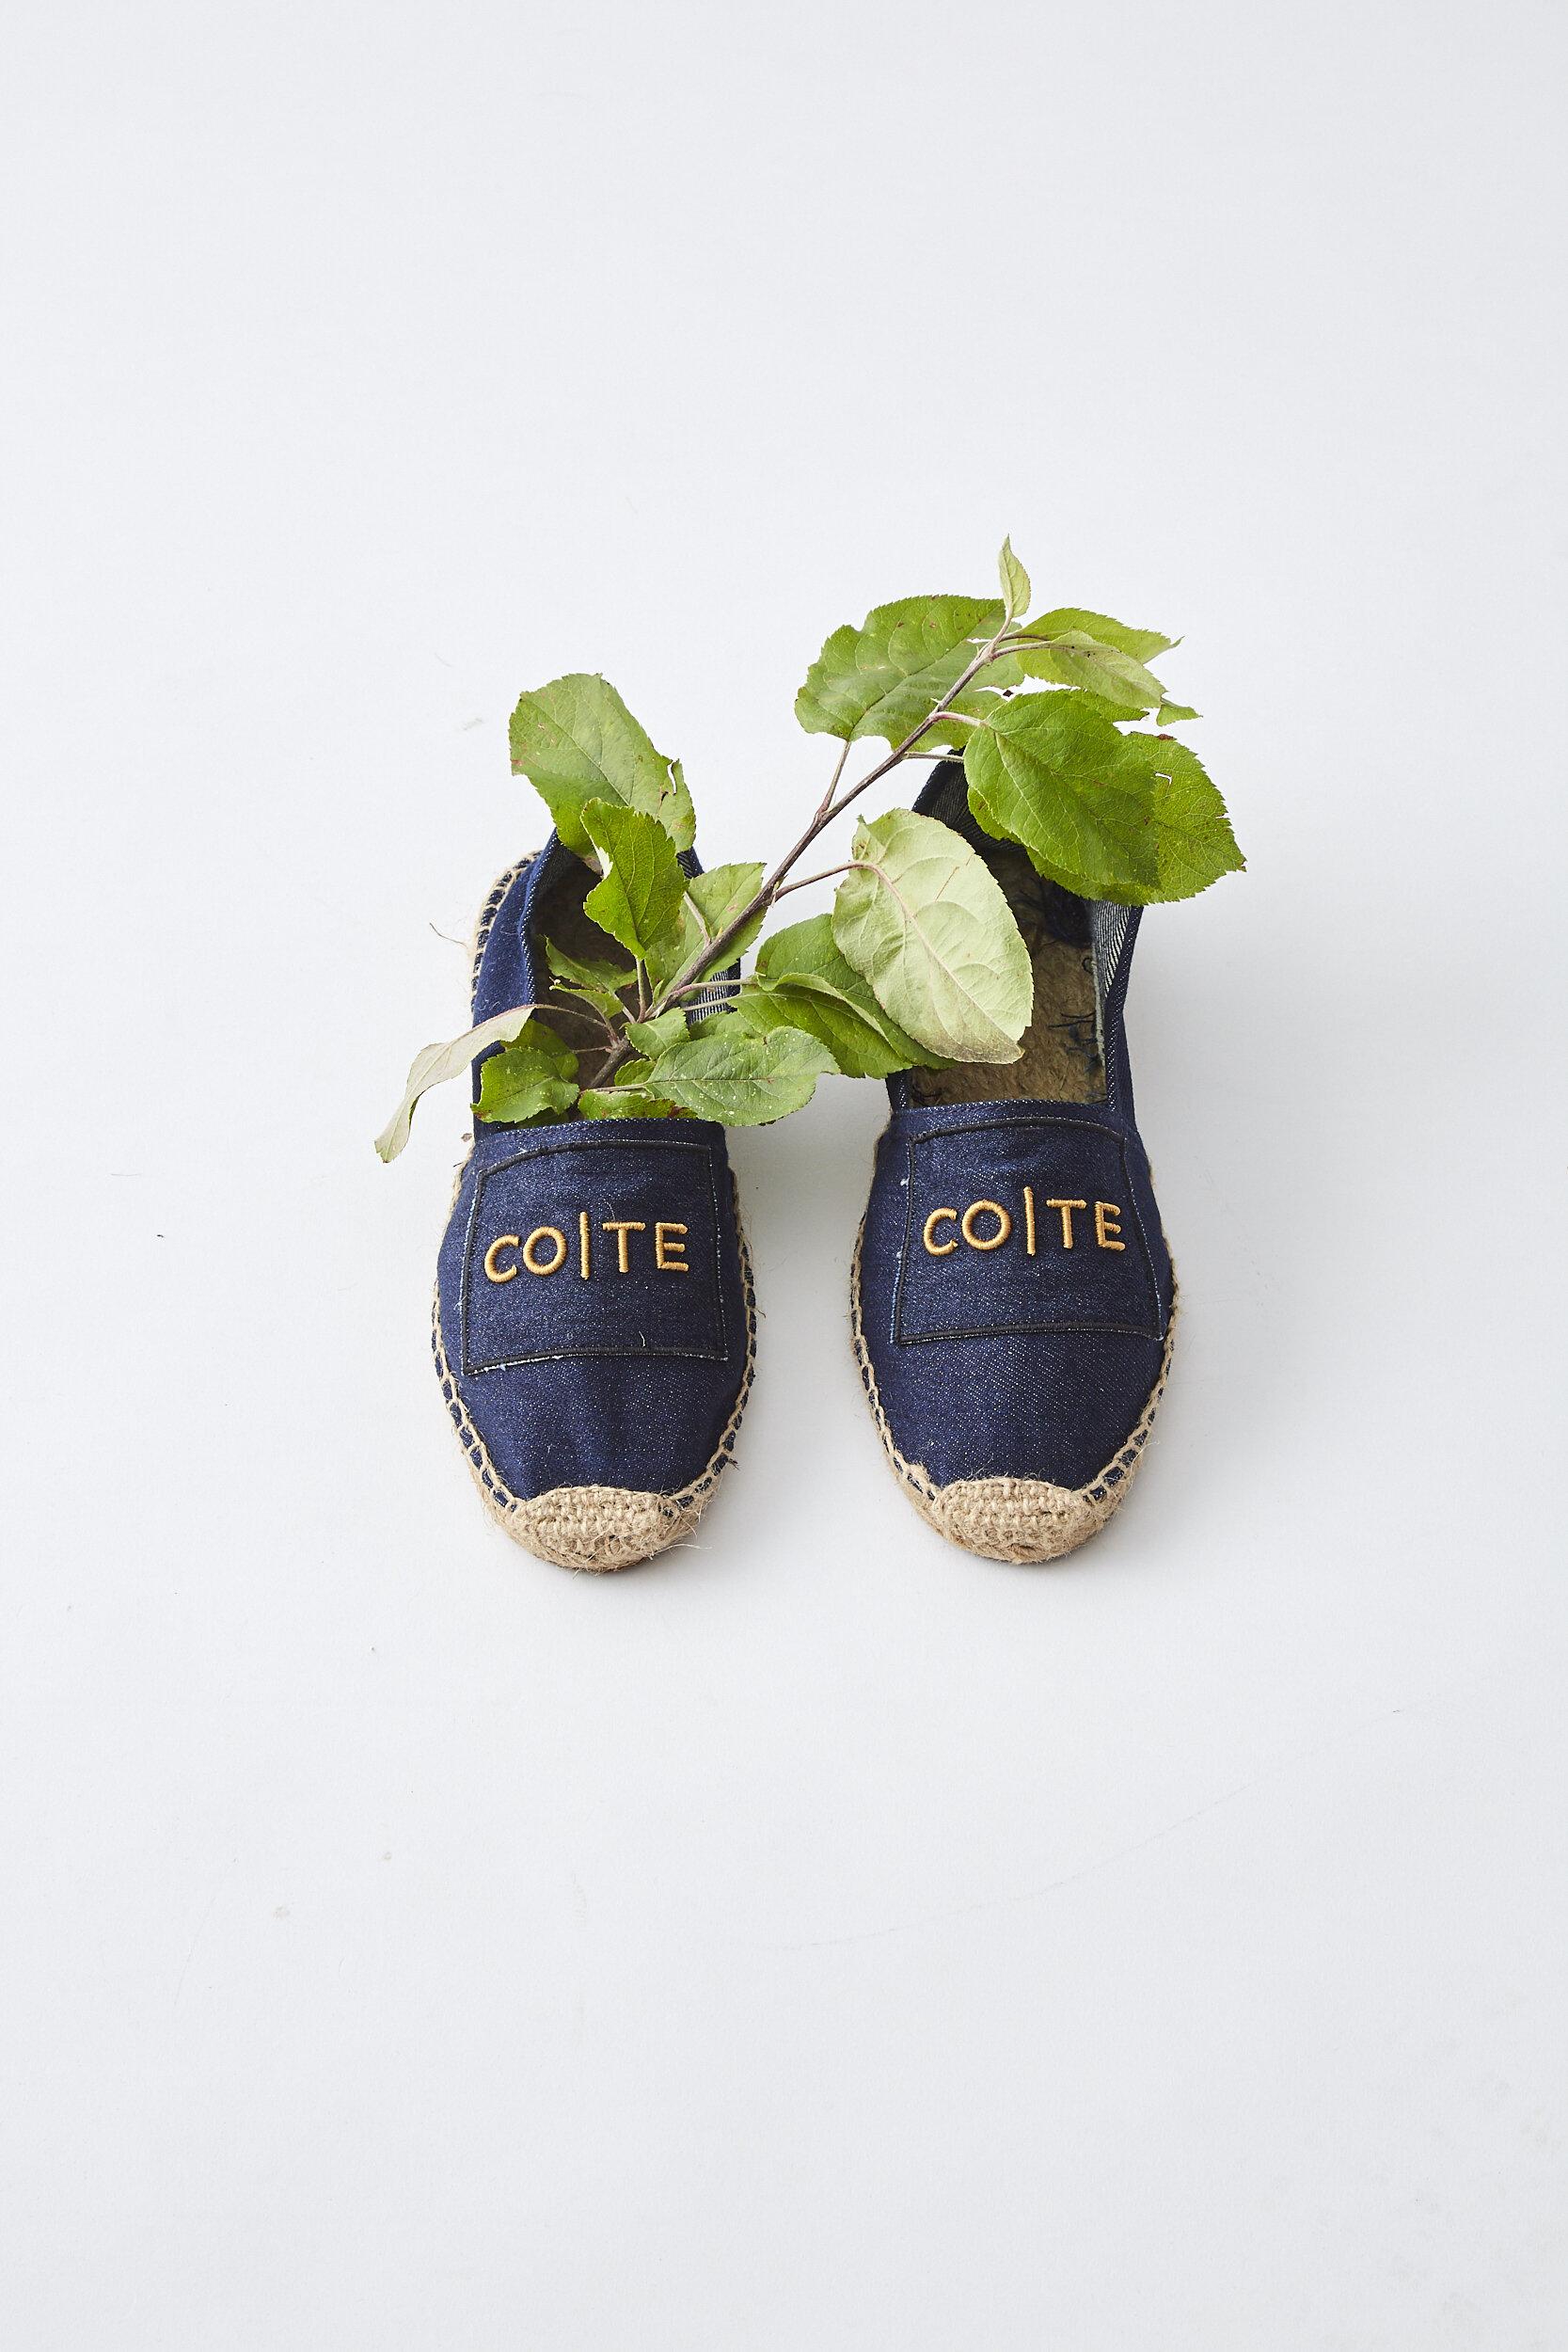 COTE SS2020 Shoes